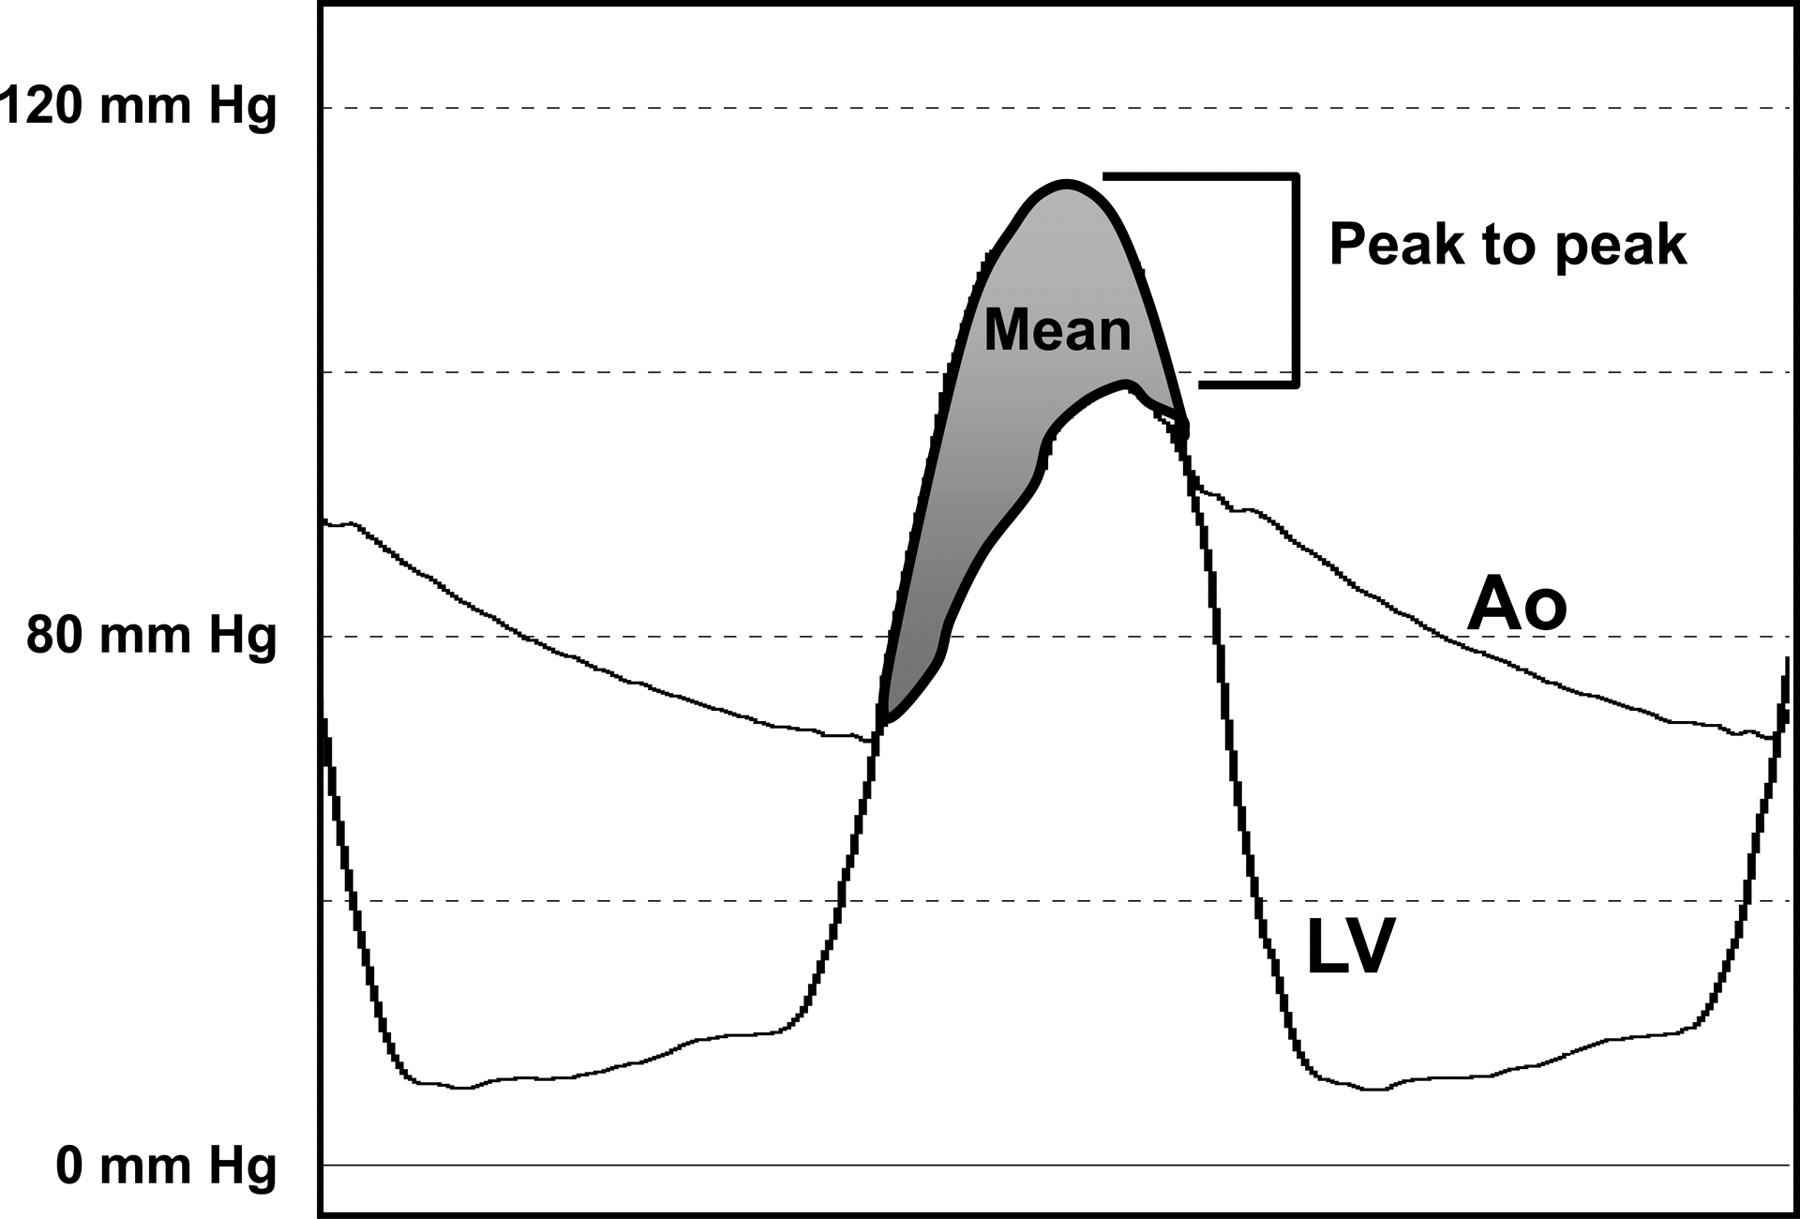 Hemodynamics In The Cardiac Catheterization Laboratory Of